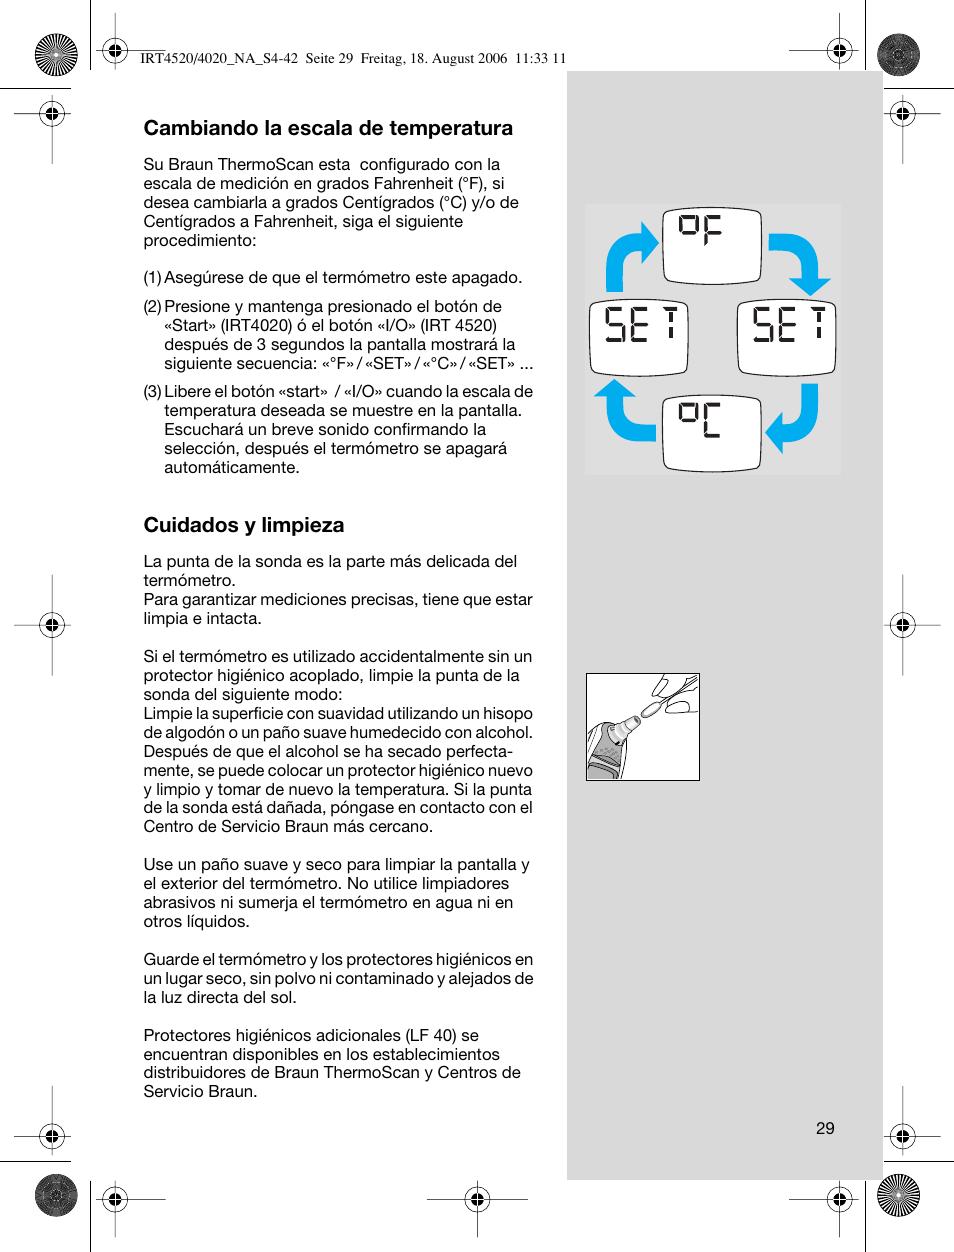 braun thermoscan irt 4520 manual free owners manual u2022 rh wordworksbysea com braun thermoscan user manual 6022 braun thermoscan 6022 instruction manual